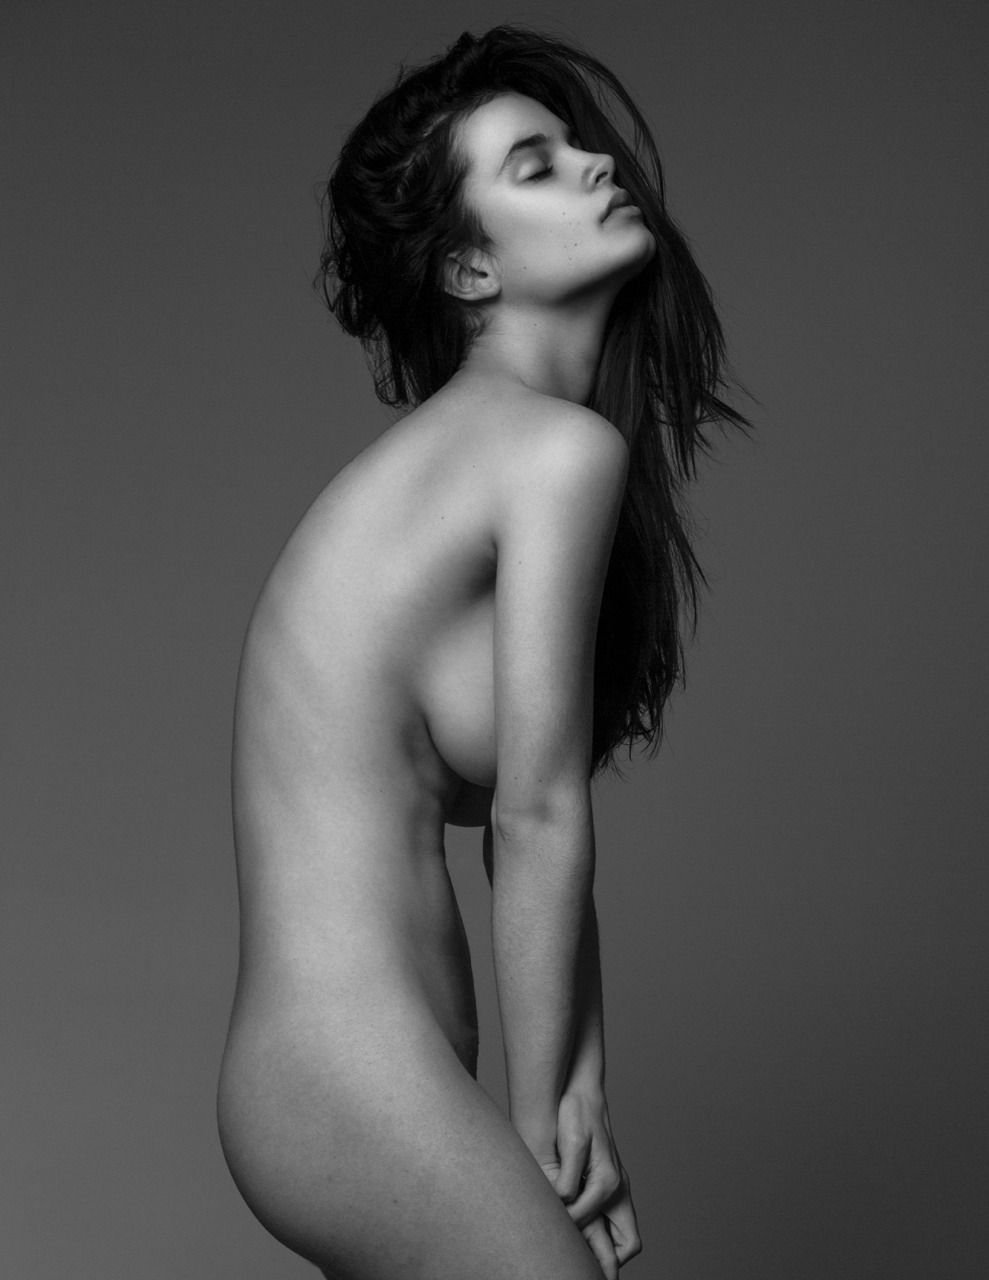 Tatiana dieteman topless - 2019 year